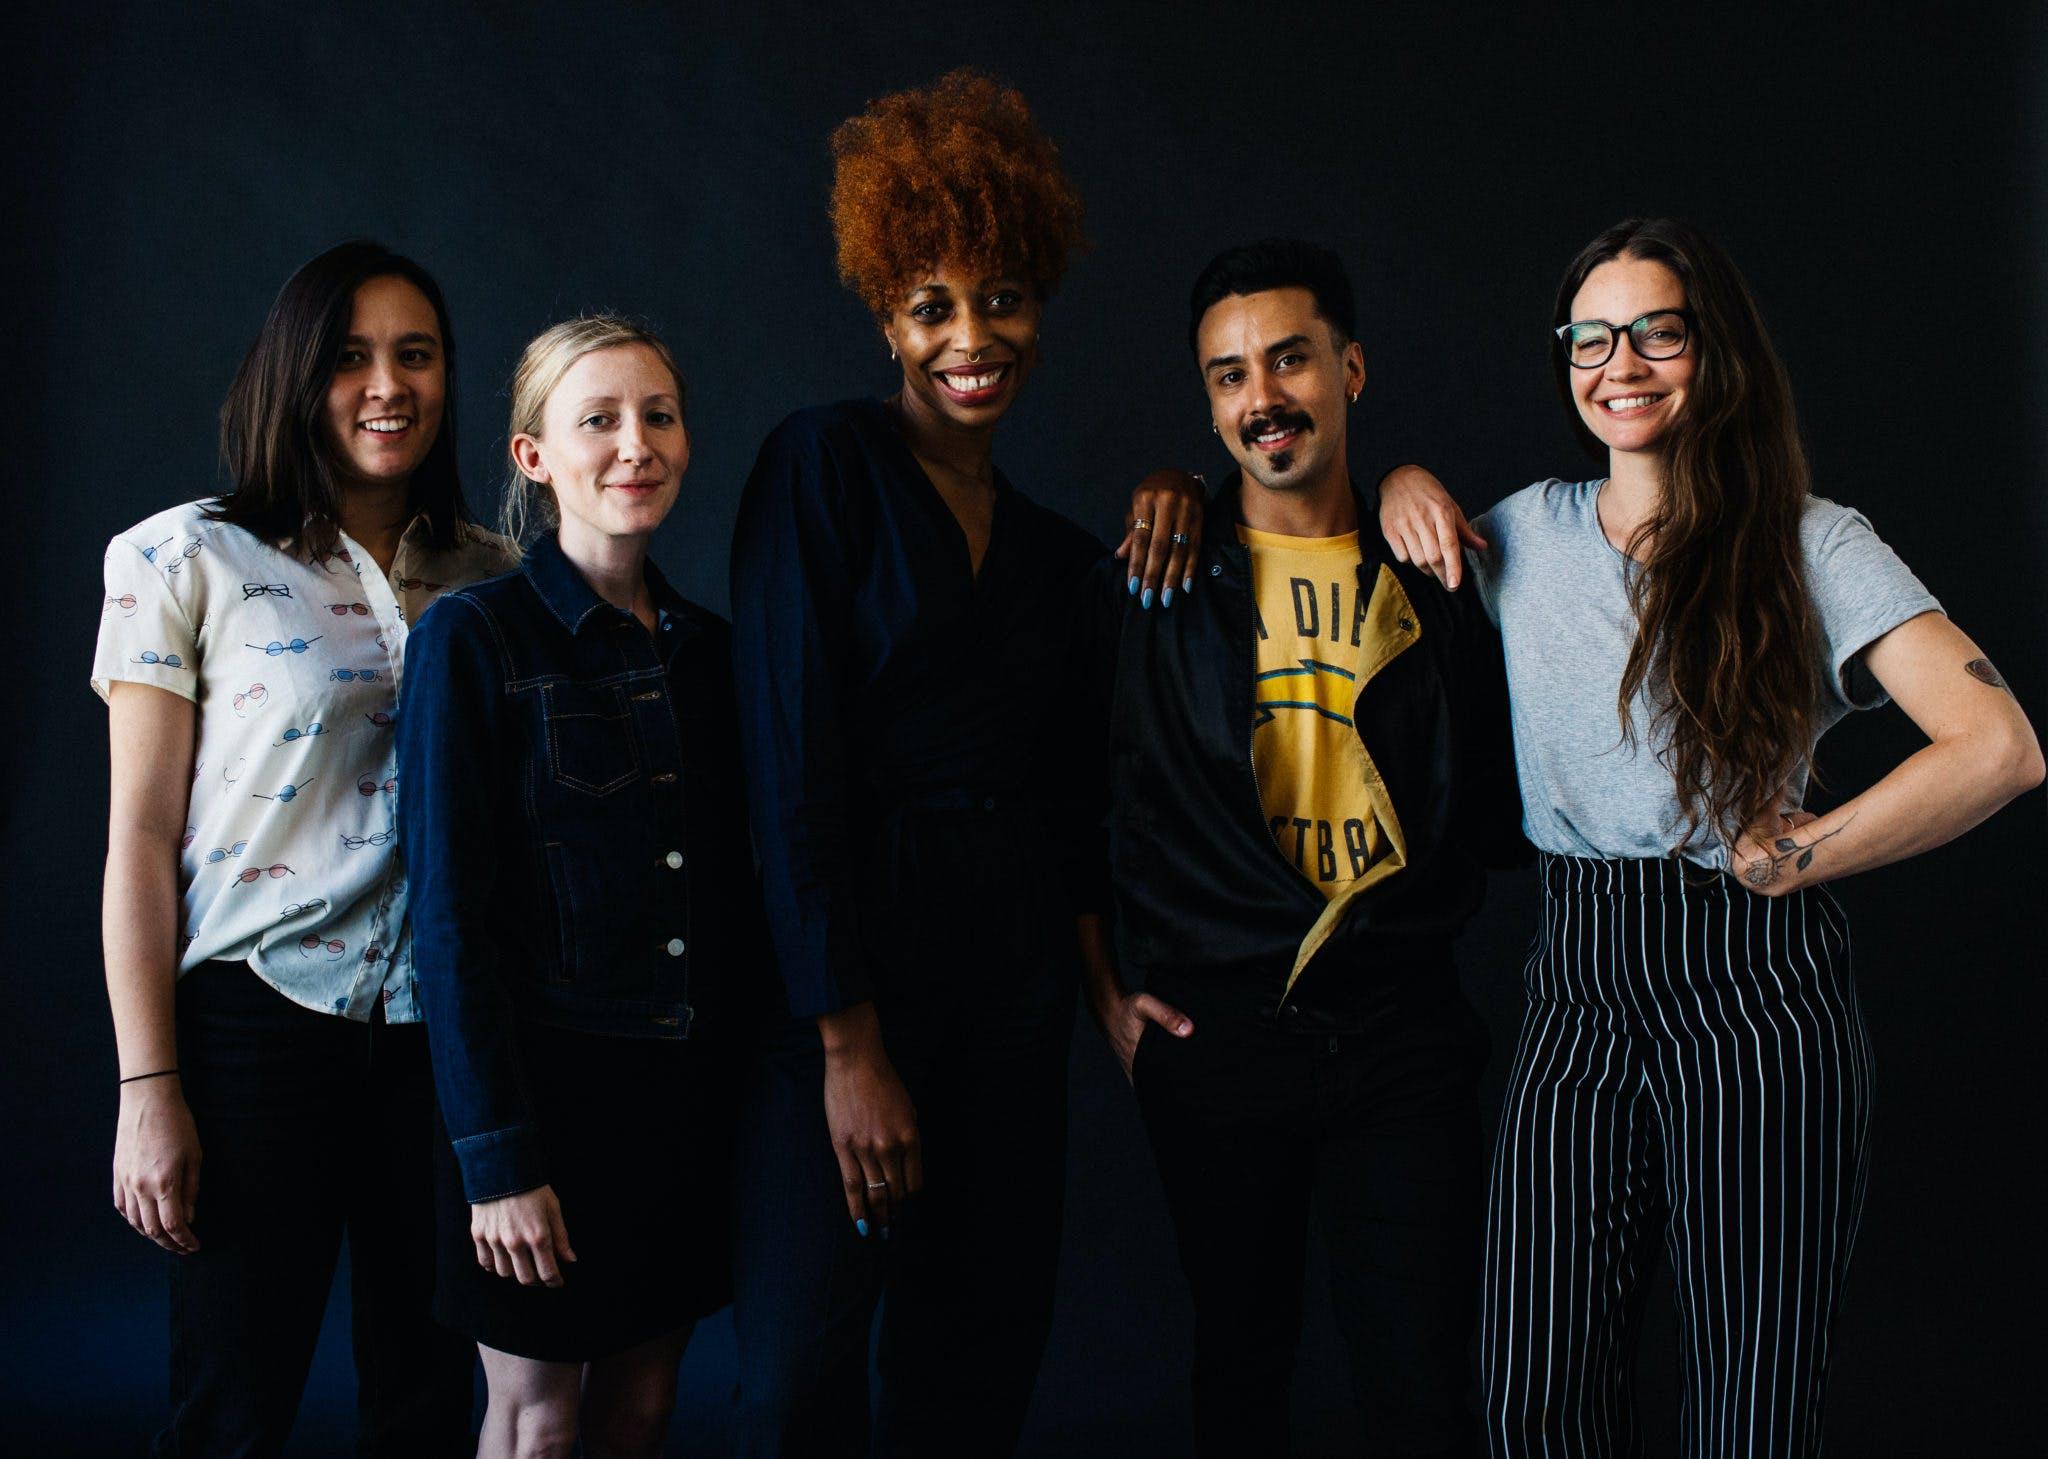 Vsco Voices team